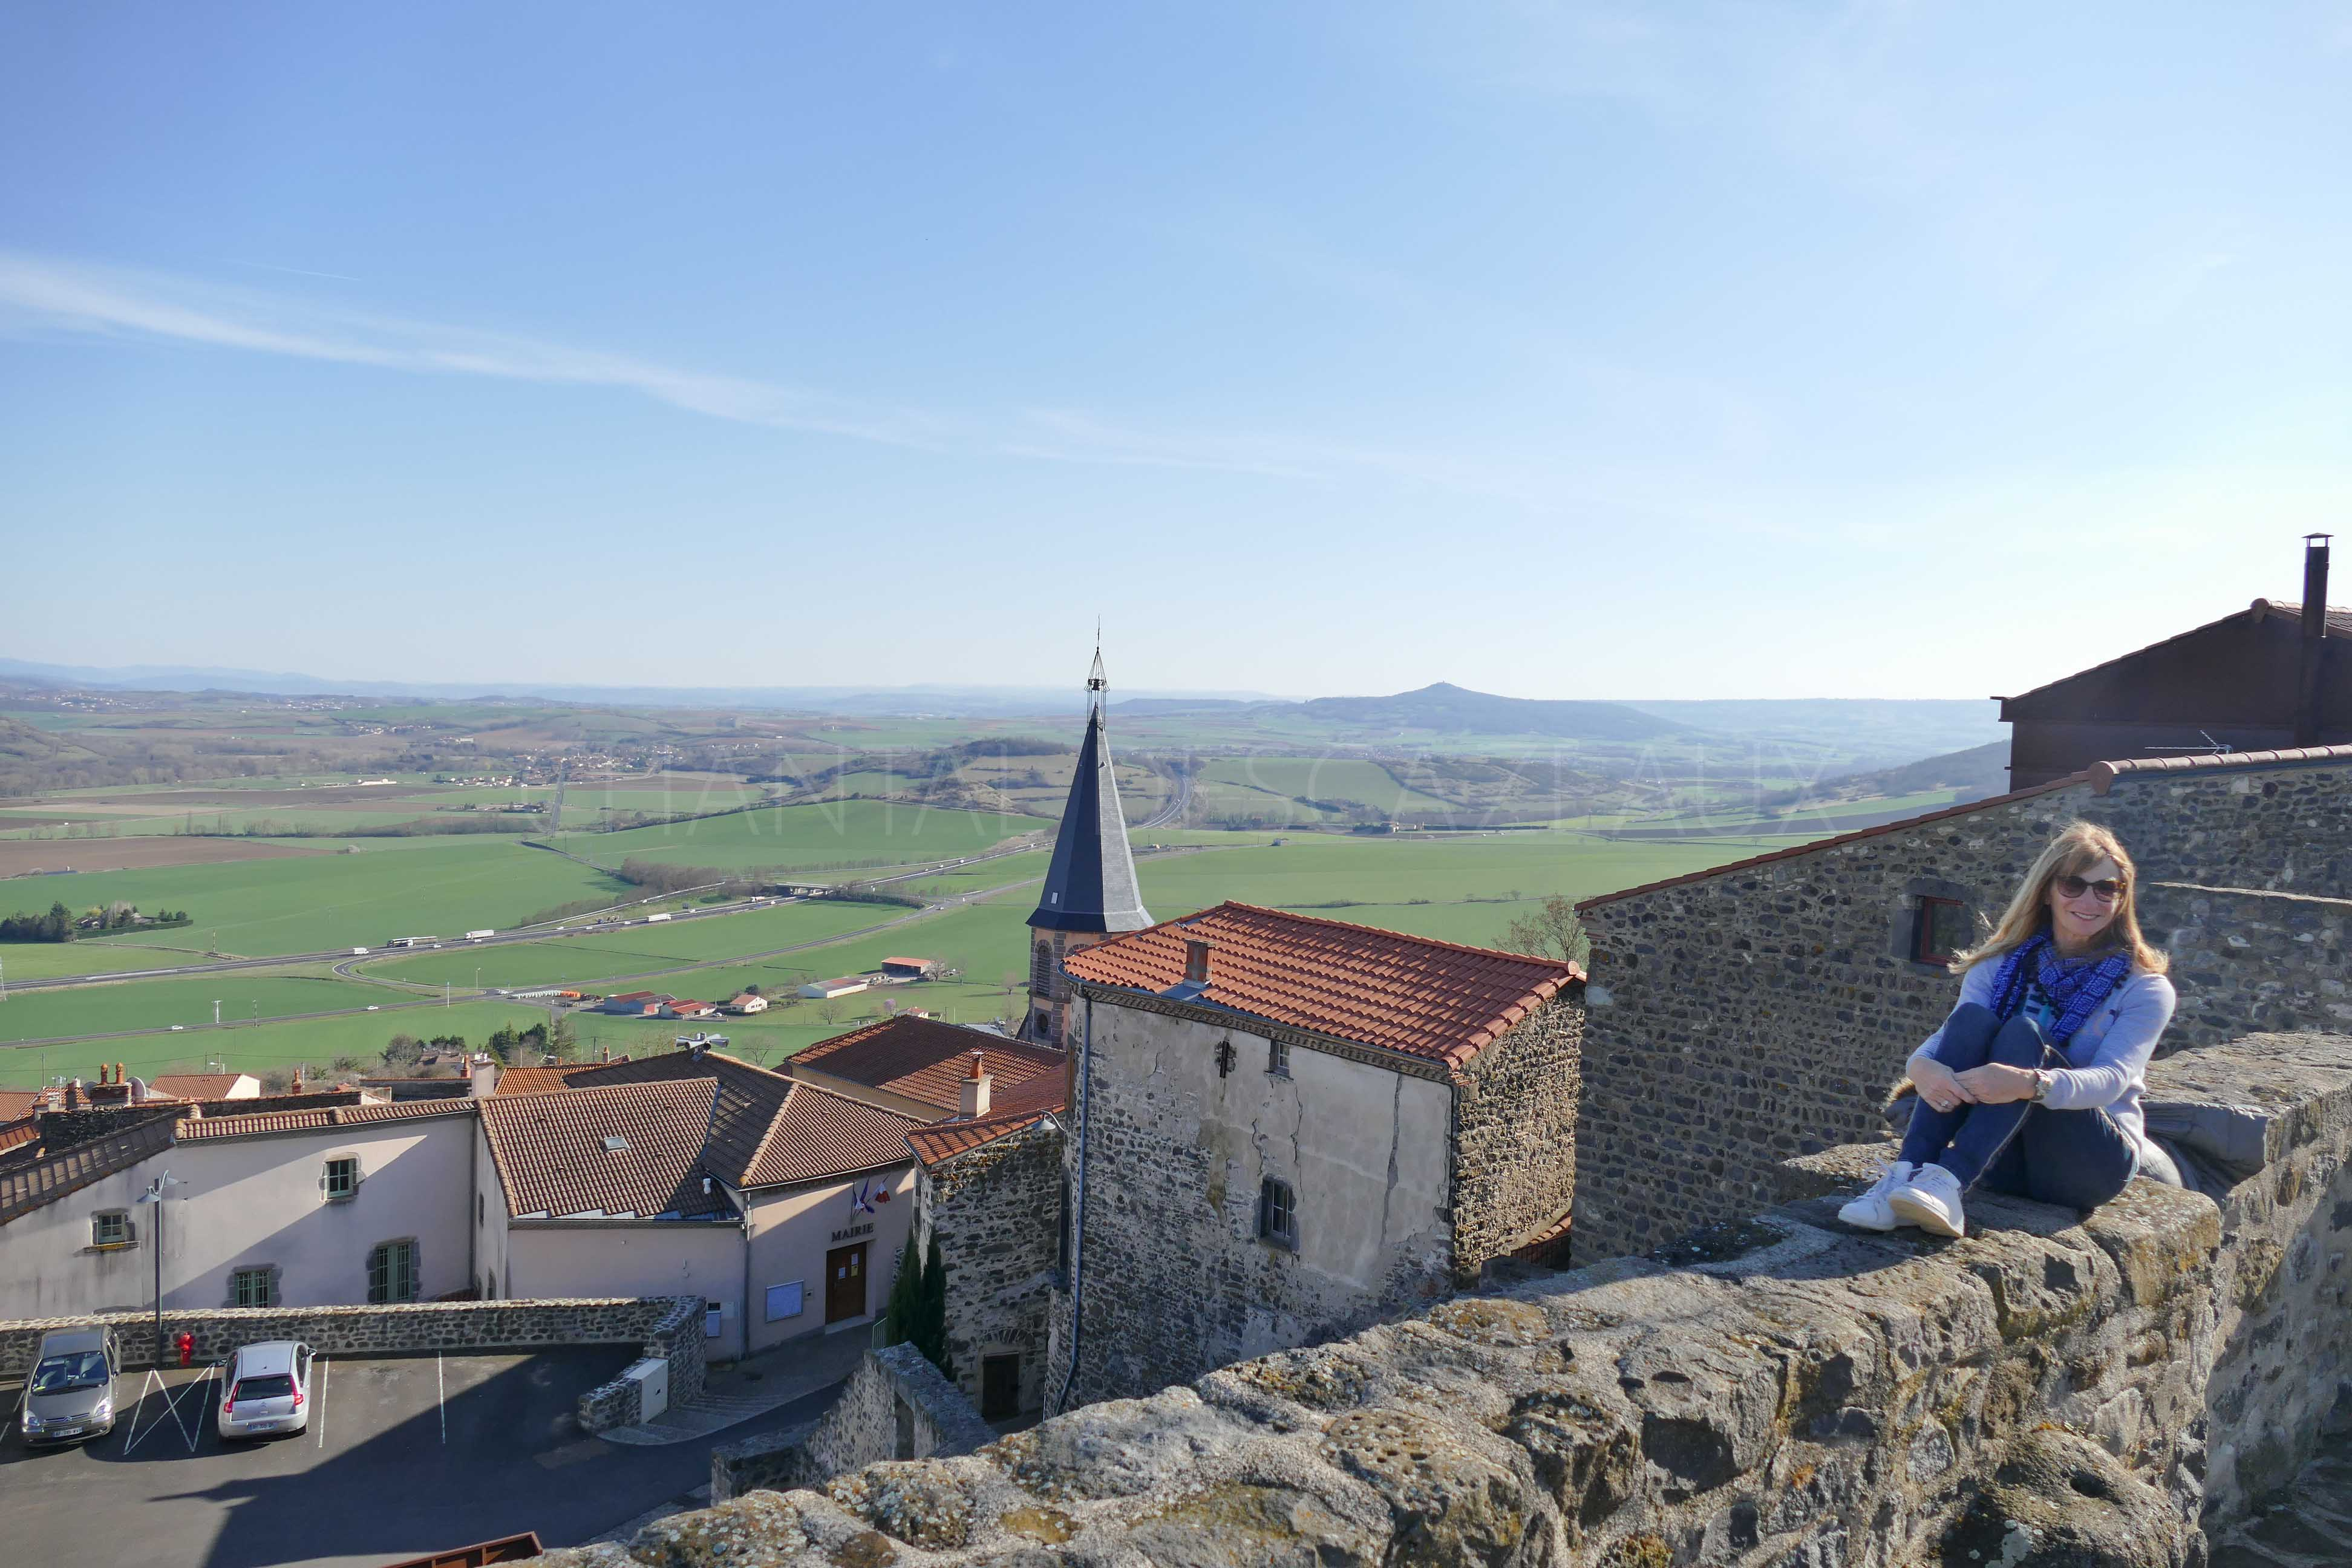 Hôtel Origines en Auvergne